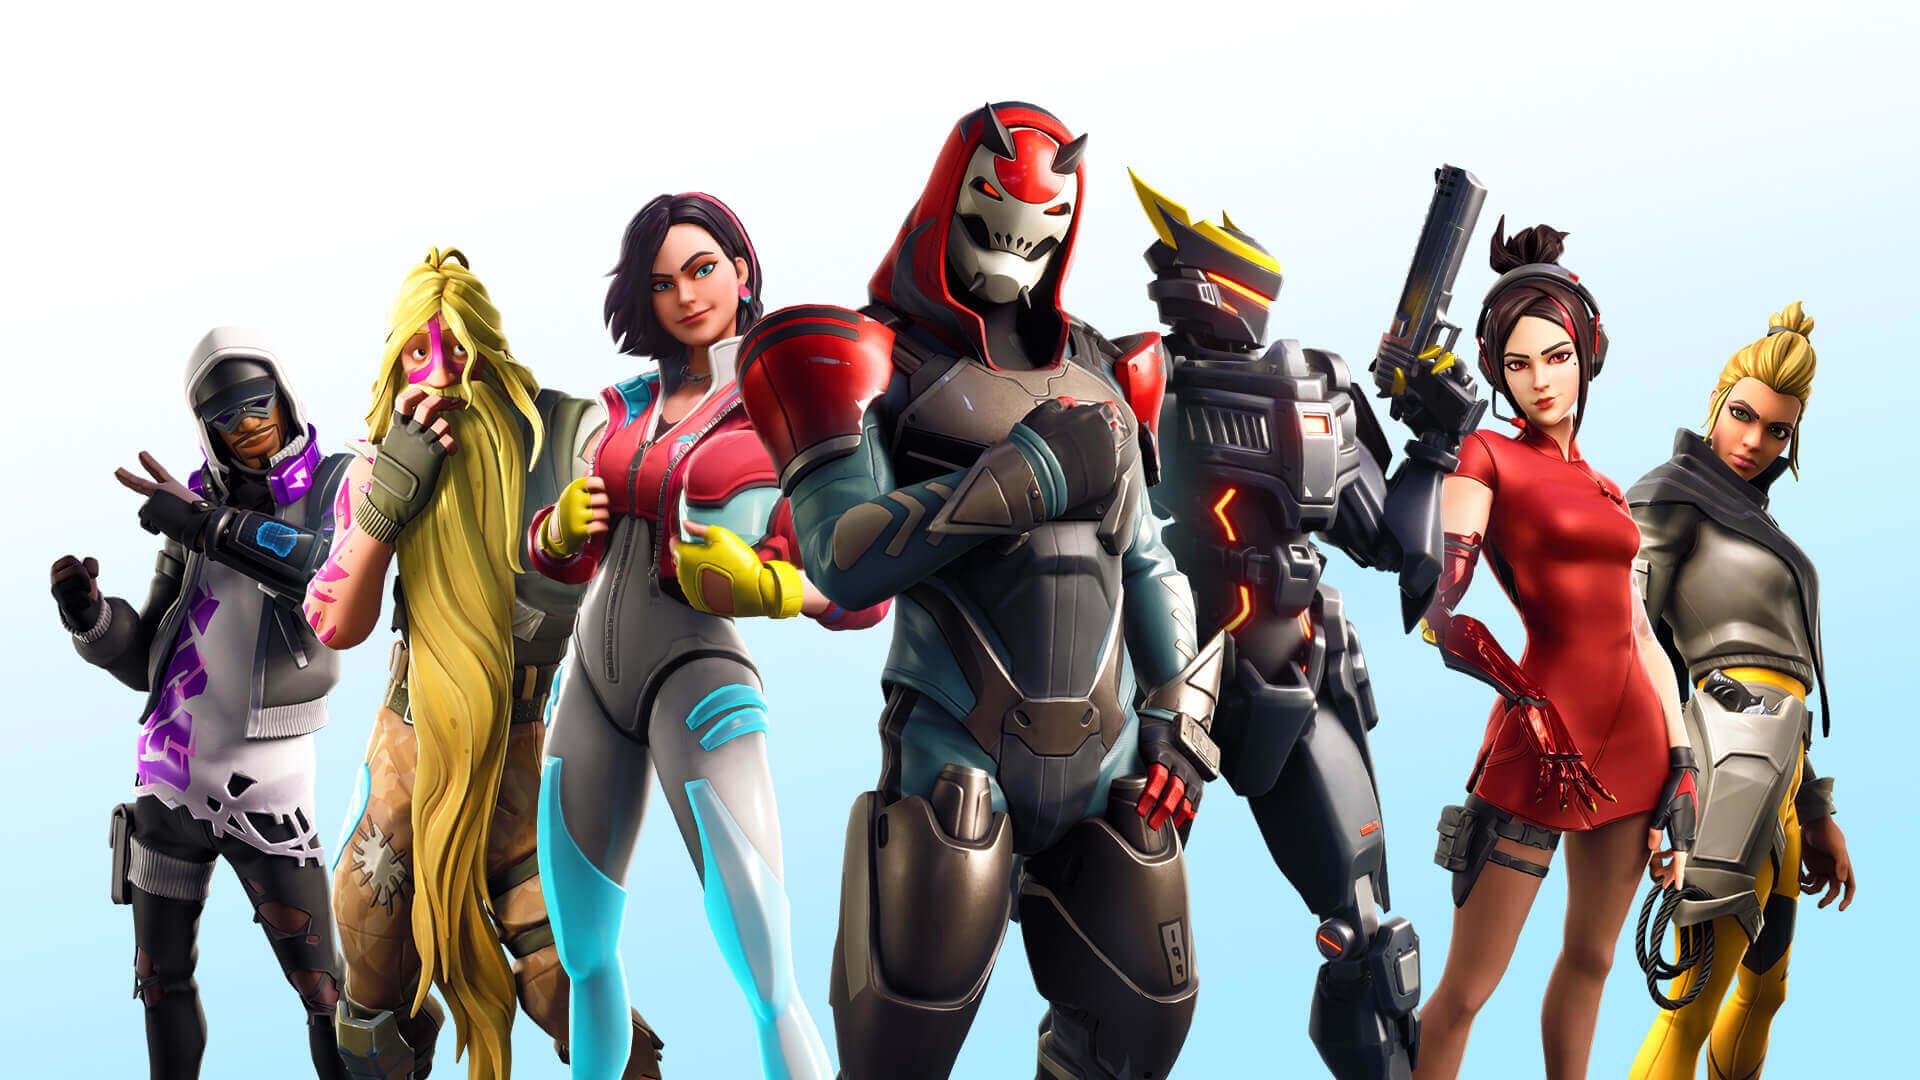 Fortnite Season 9 via Epic Games